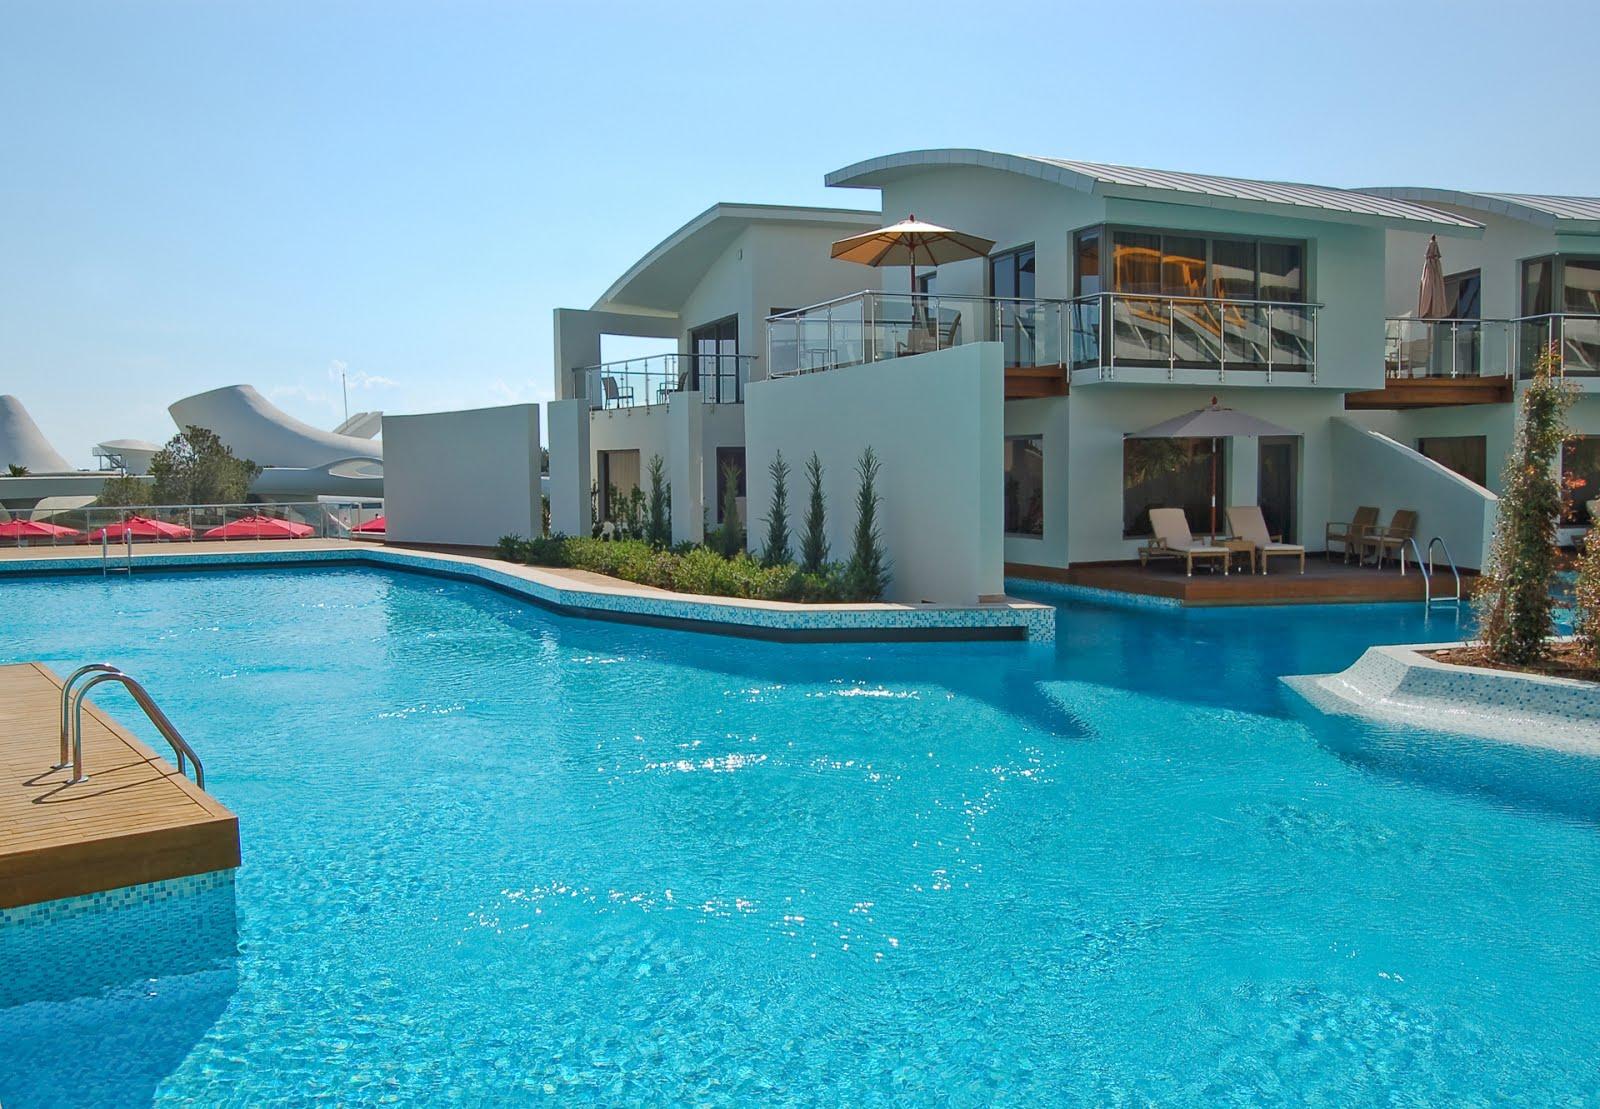 banco de im genes casa moderna con piscina enorme de